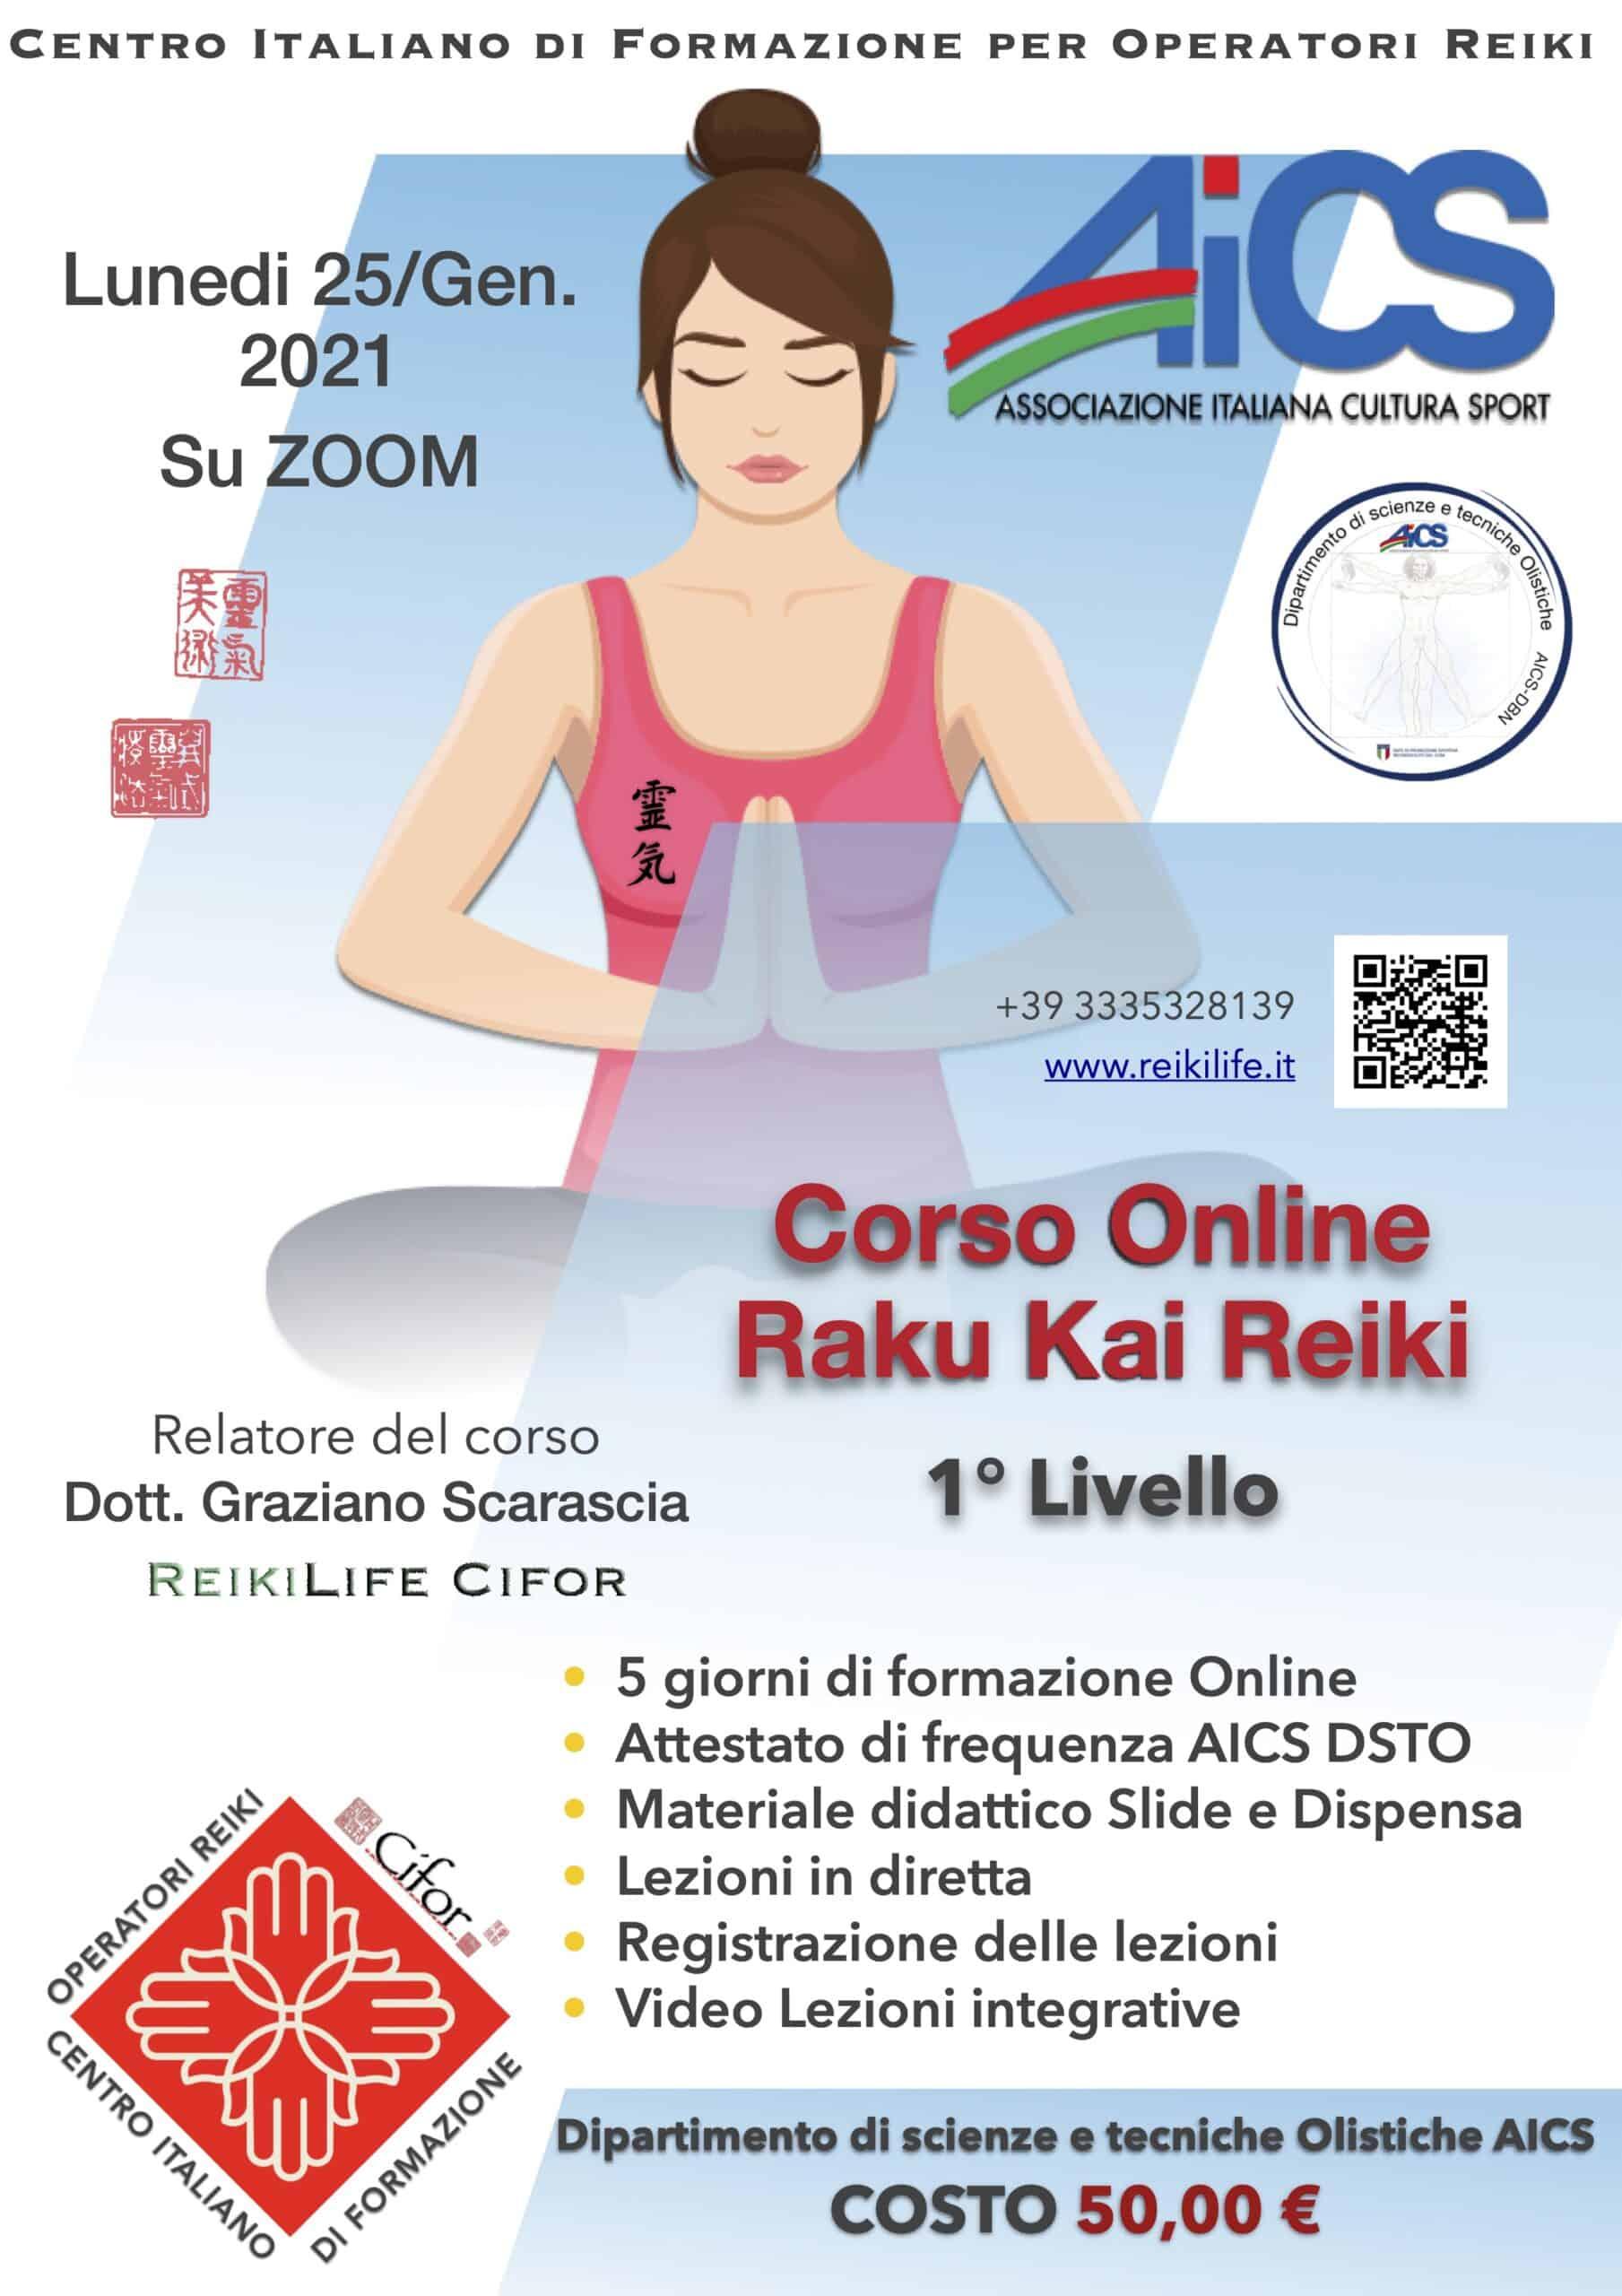 Corso online raku Kai Reiki 1 livello 25 gennaio 2021